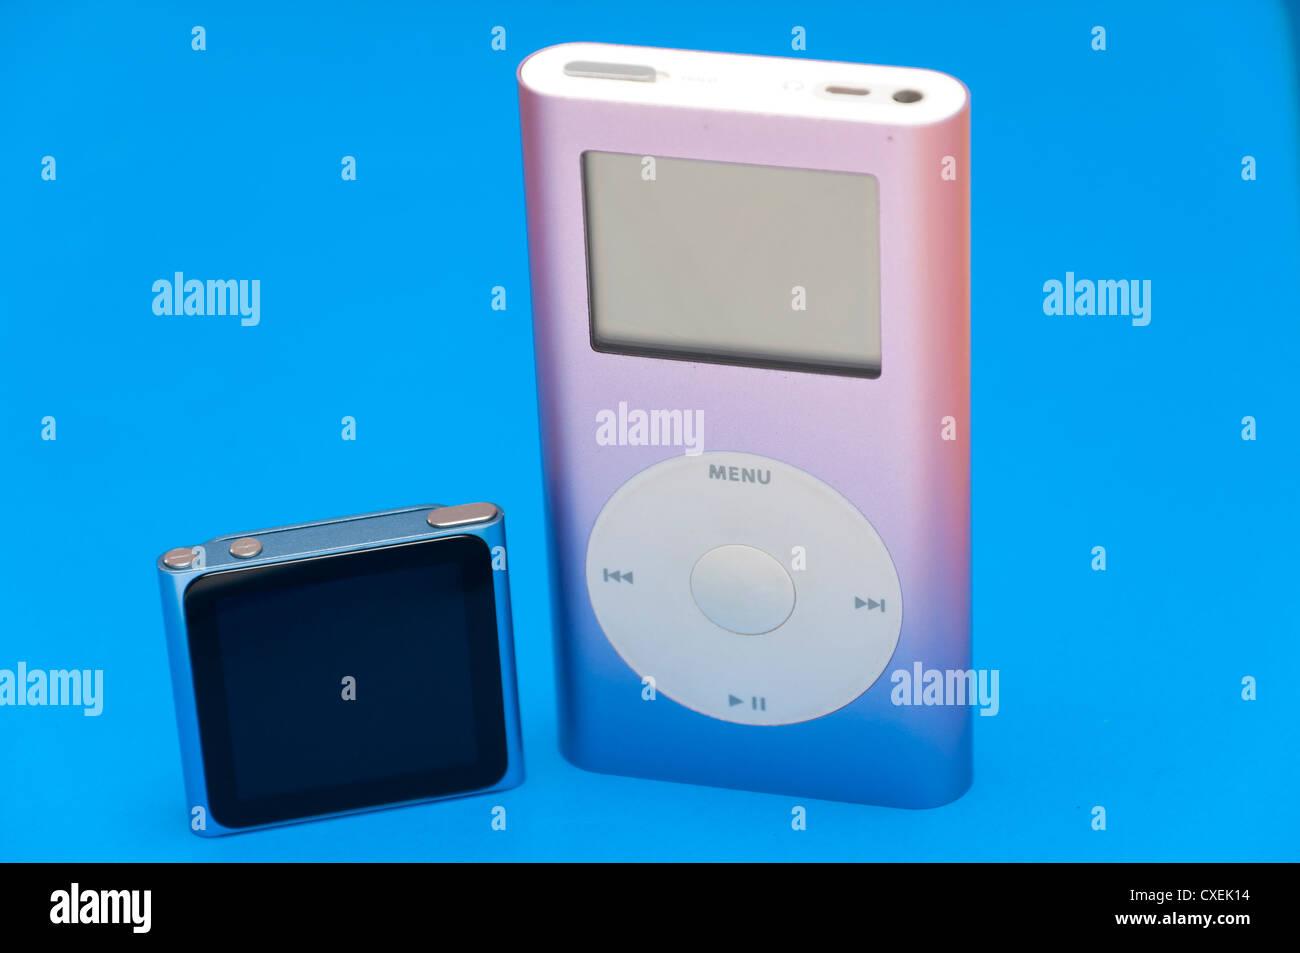 Ipod Nano And Ipod Mini Classic Side By Side Stock Photo 50724048